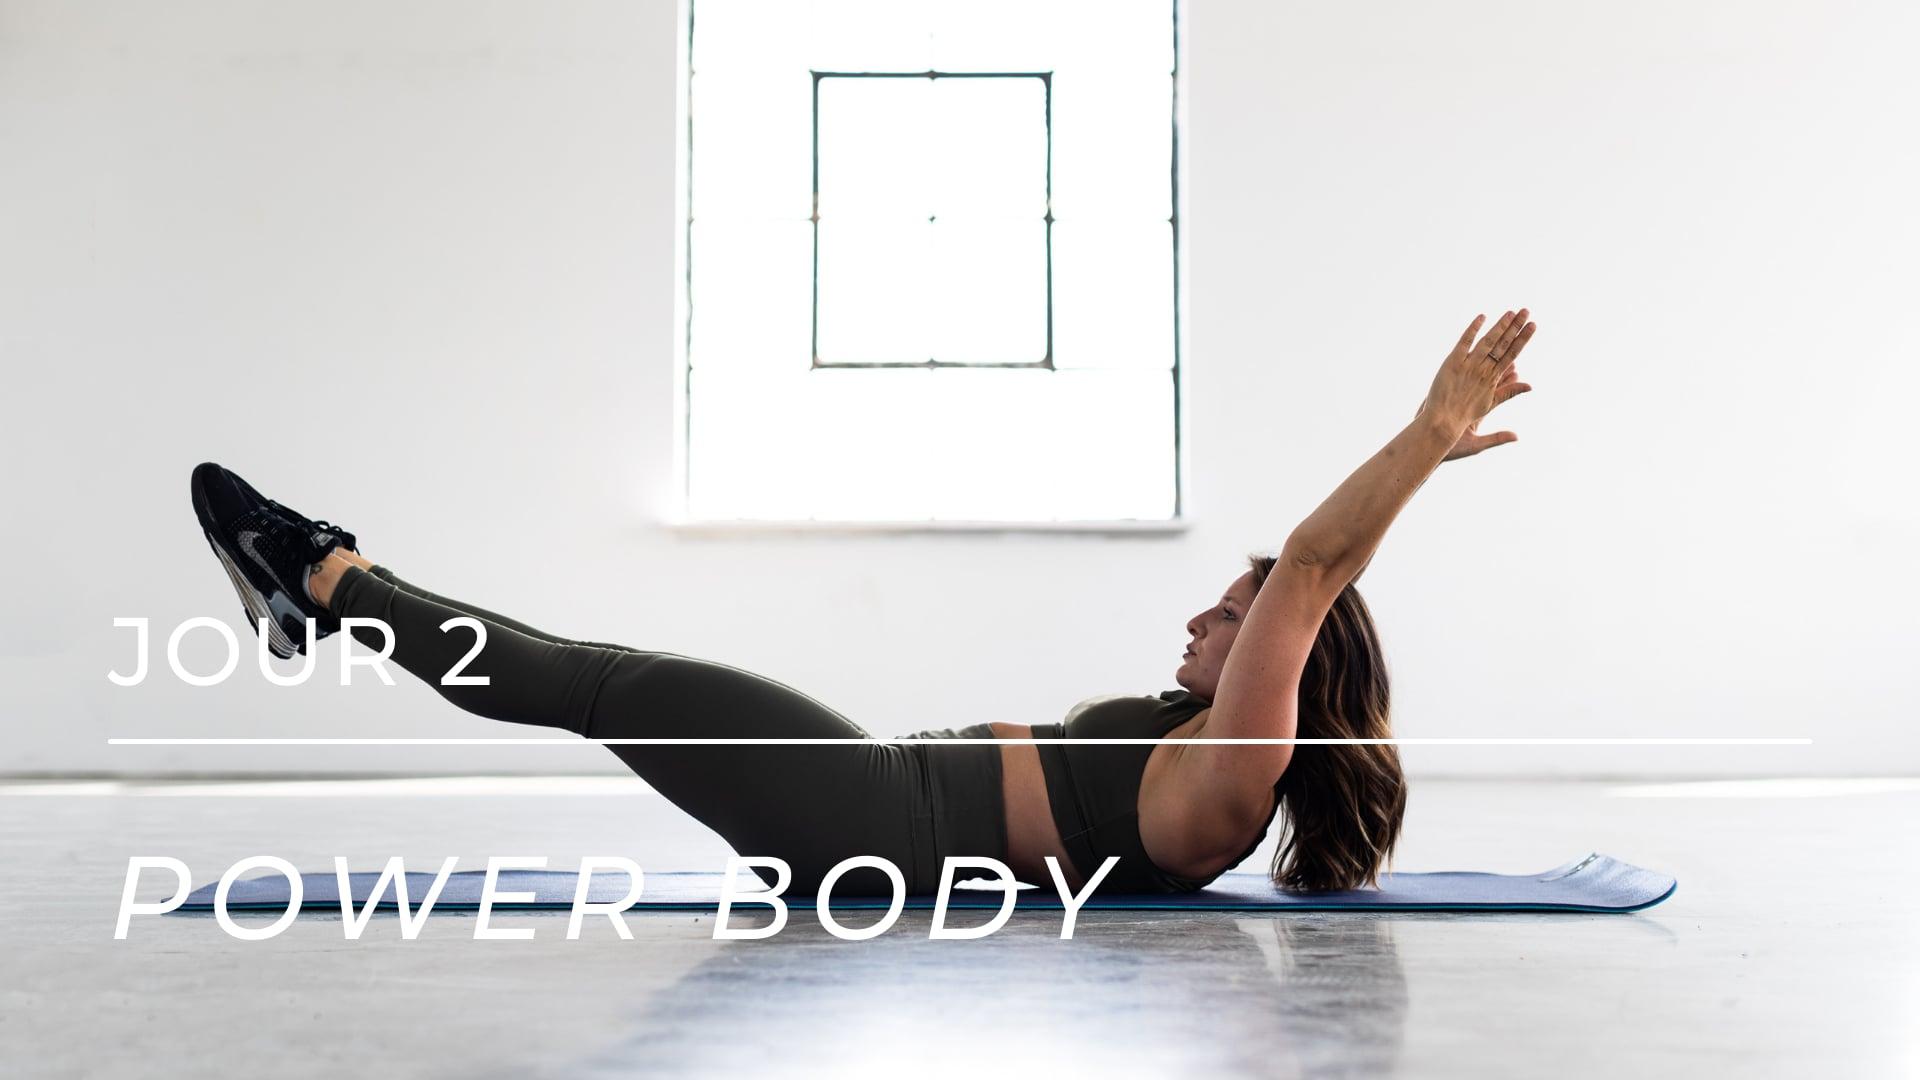 POWER BODY - Jour 2